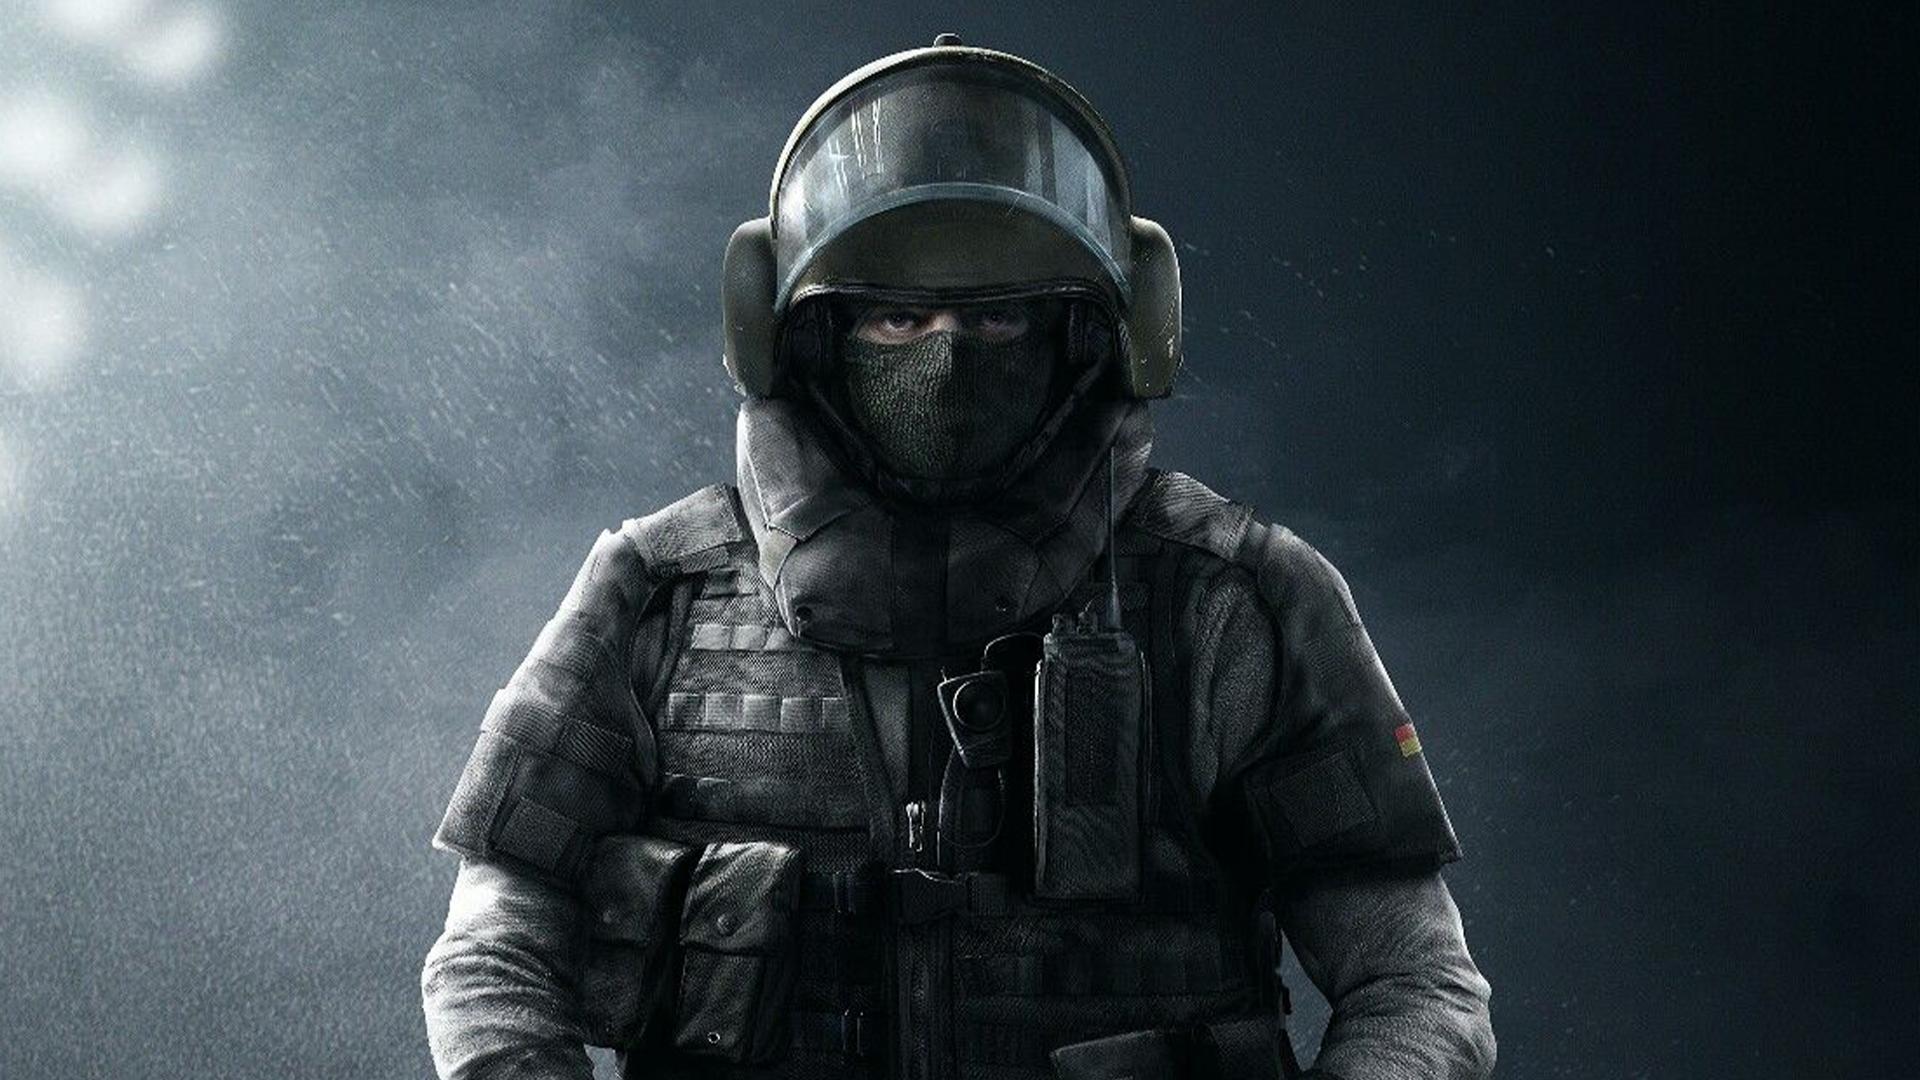 Shield operators get nerfed in the new Rainbow Six Siege